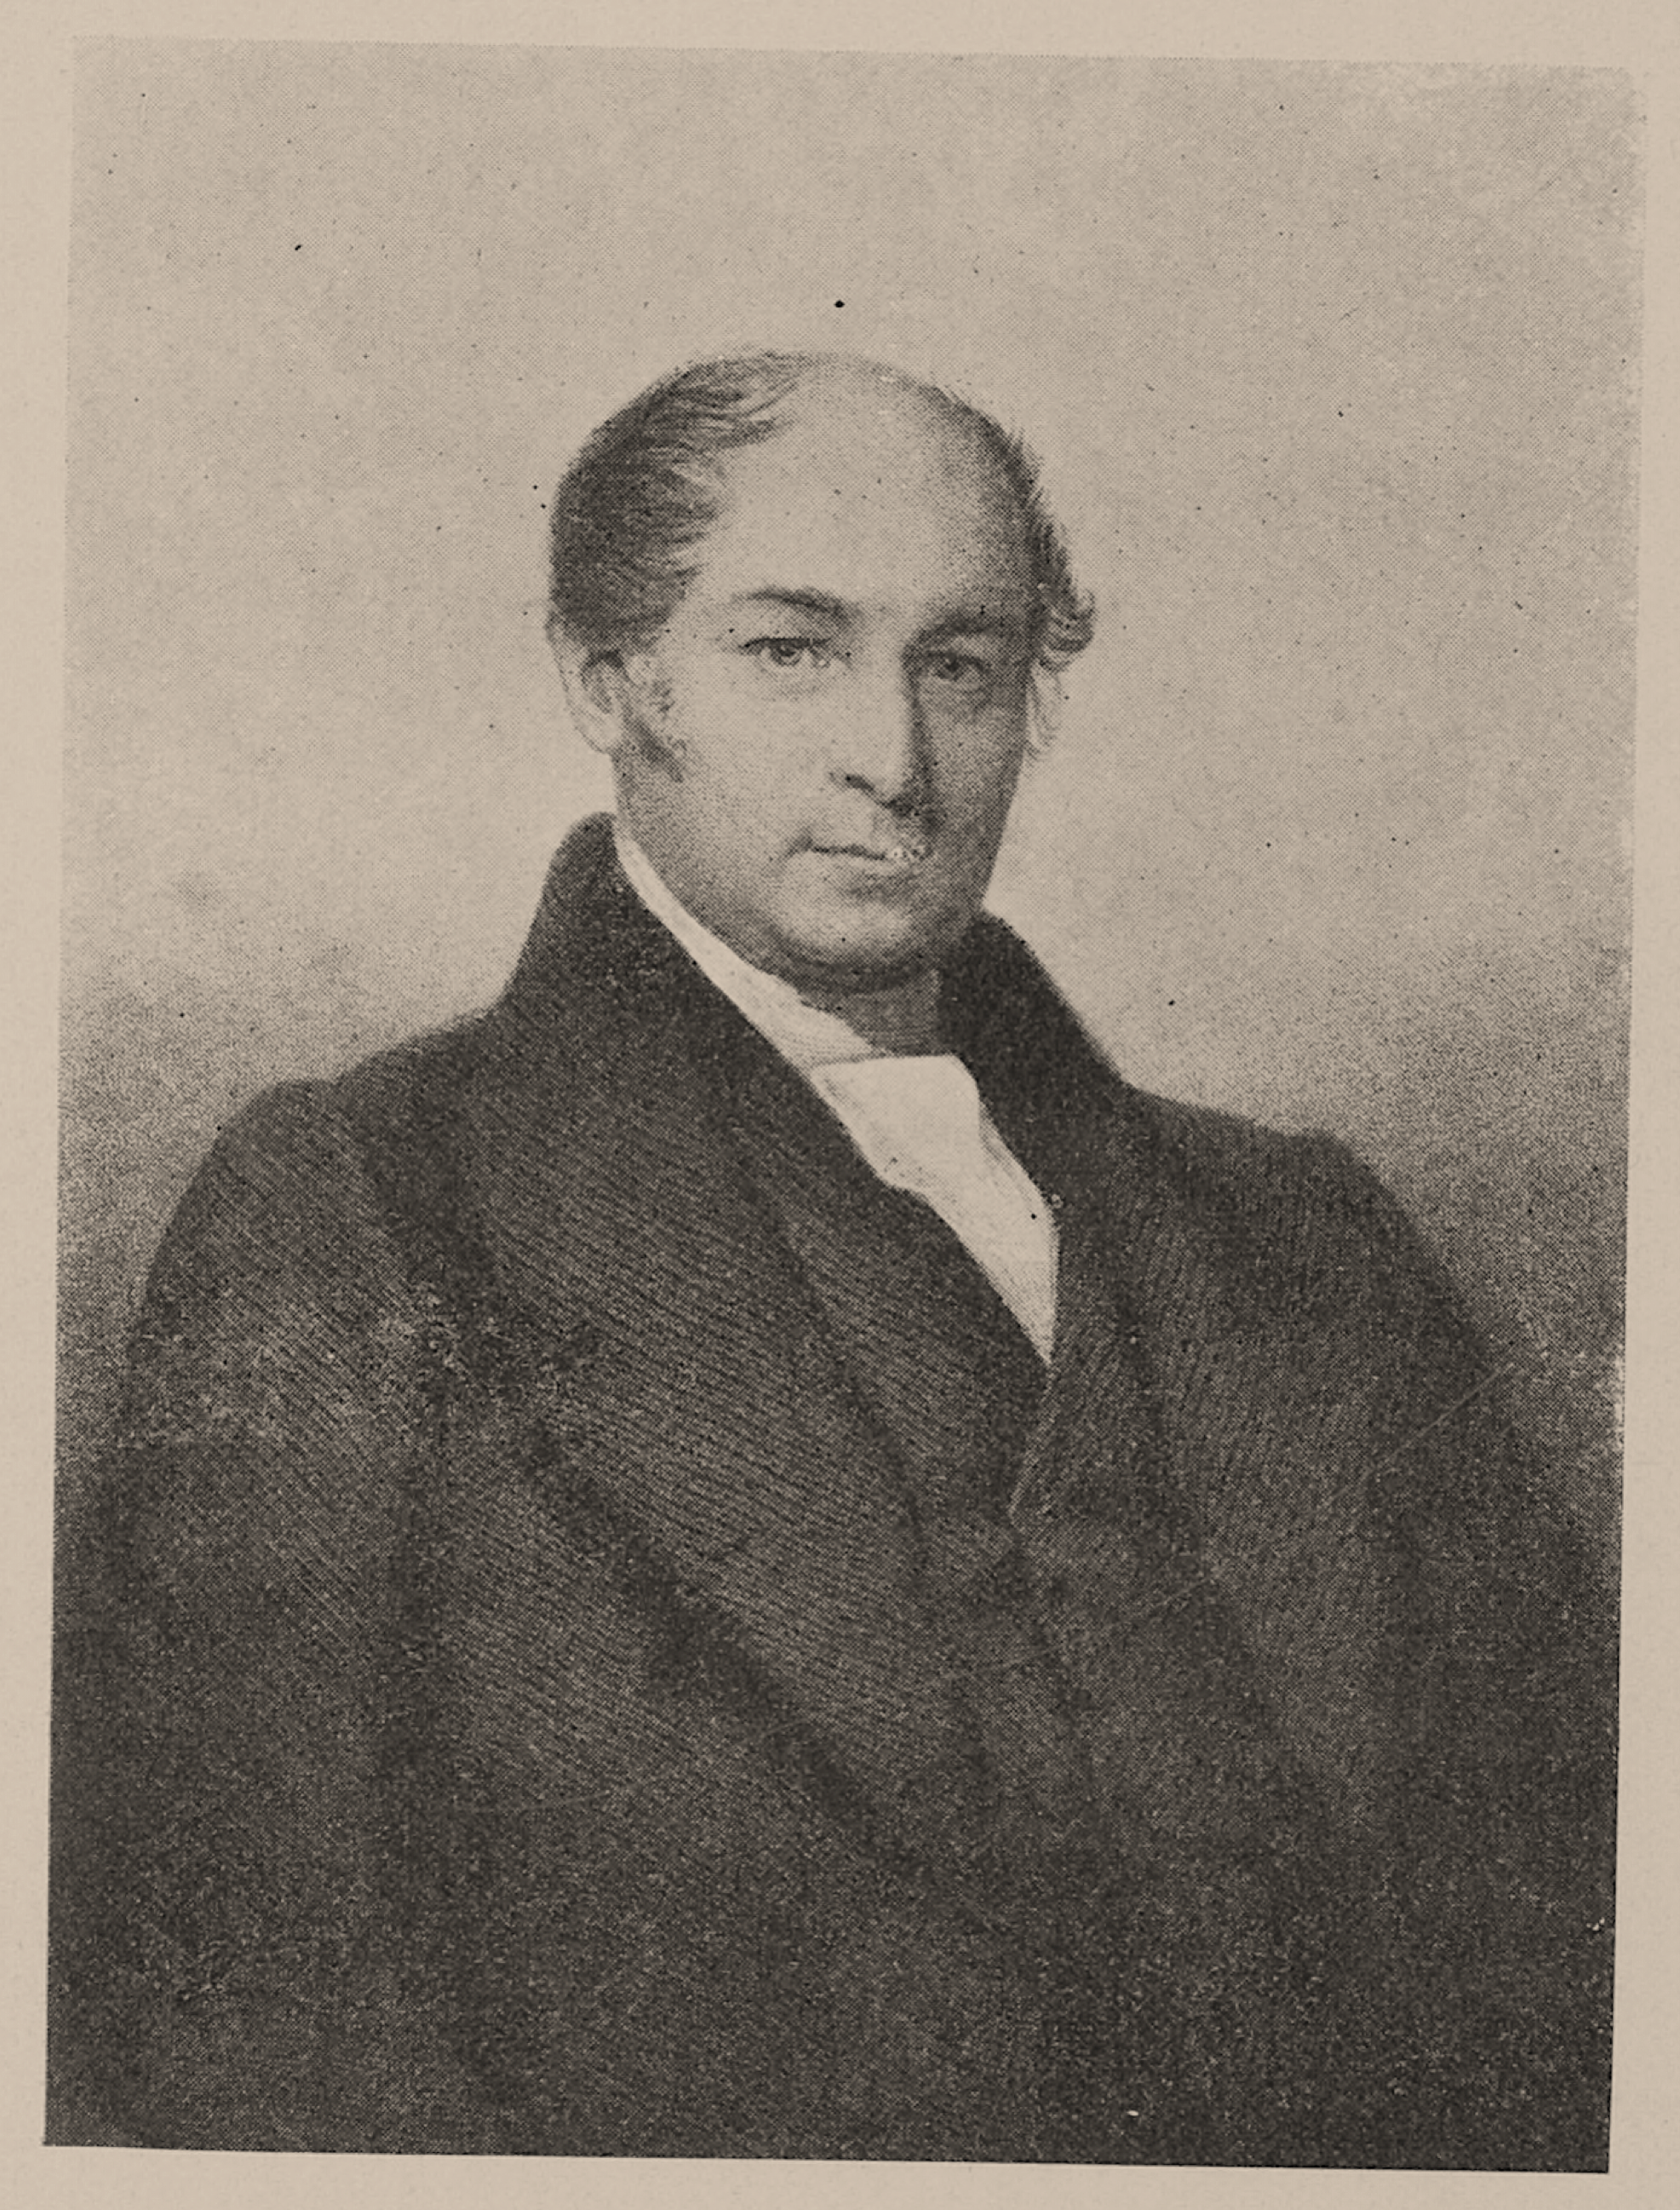 Reverend Walter Lawry